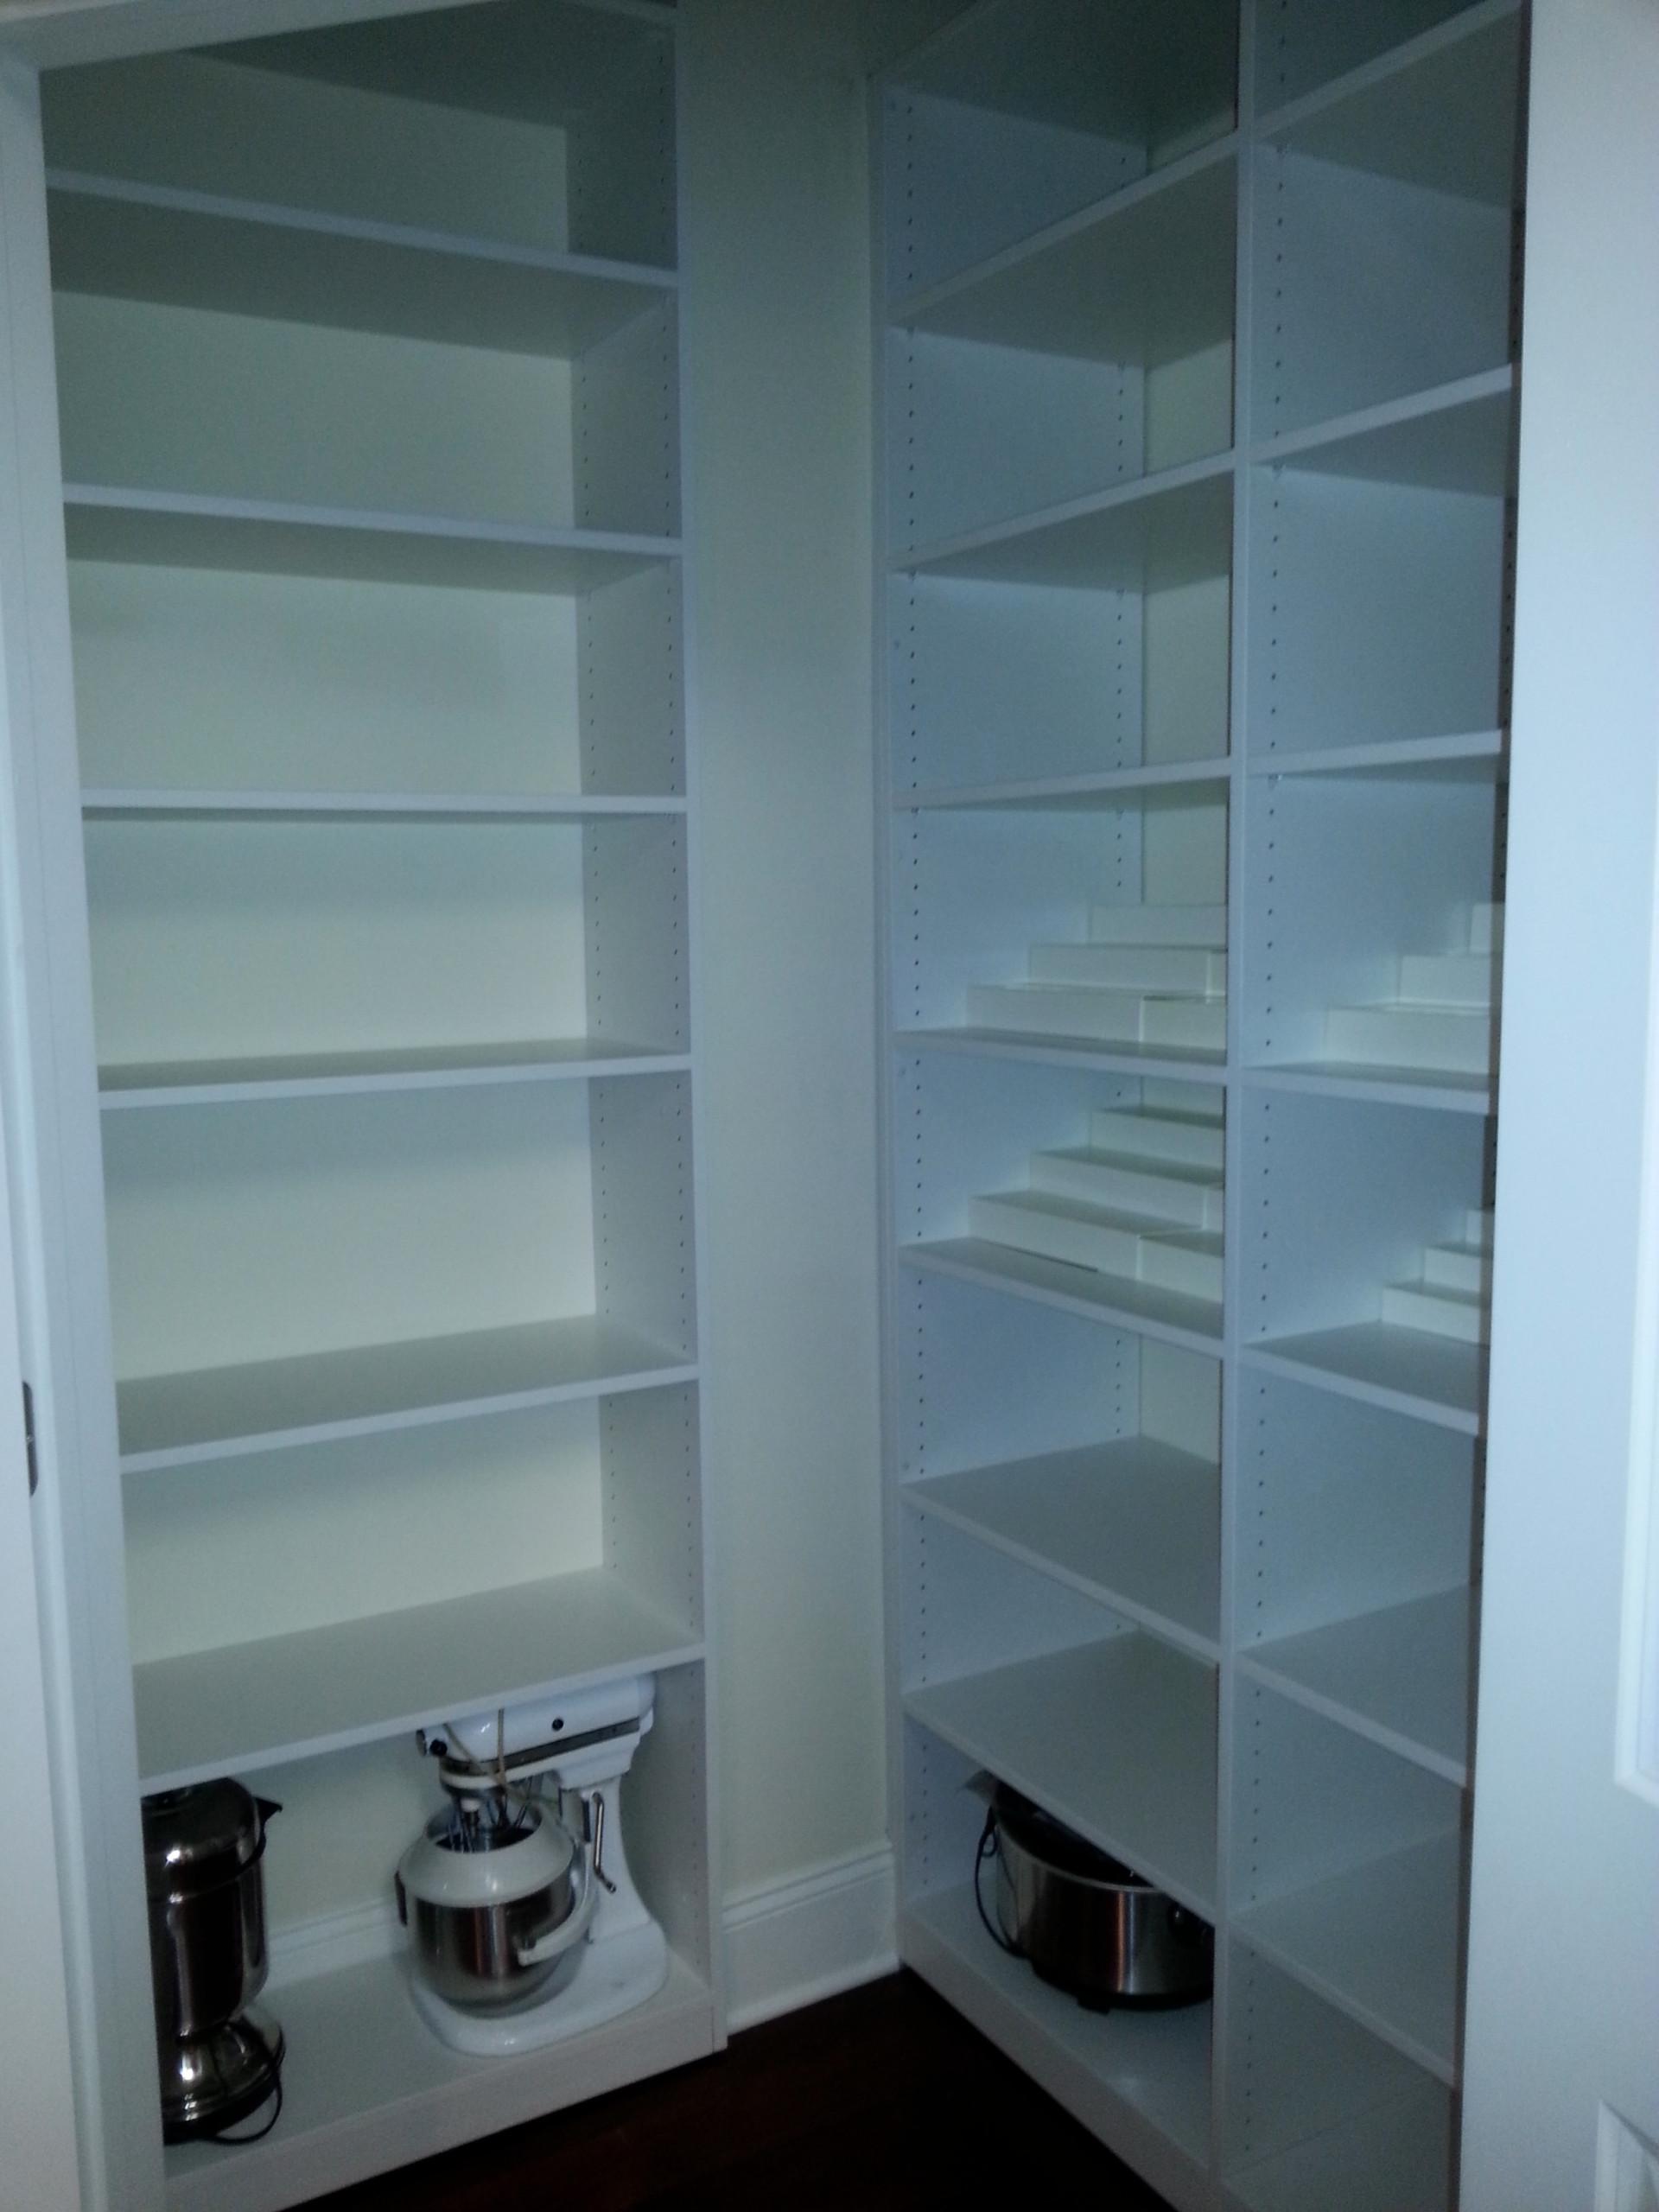 Pantries/Broom Closets